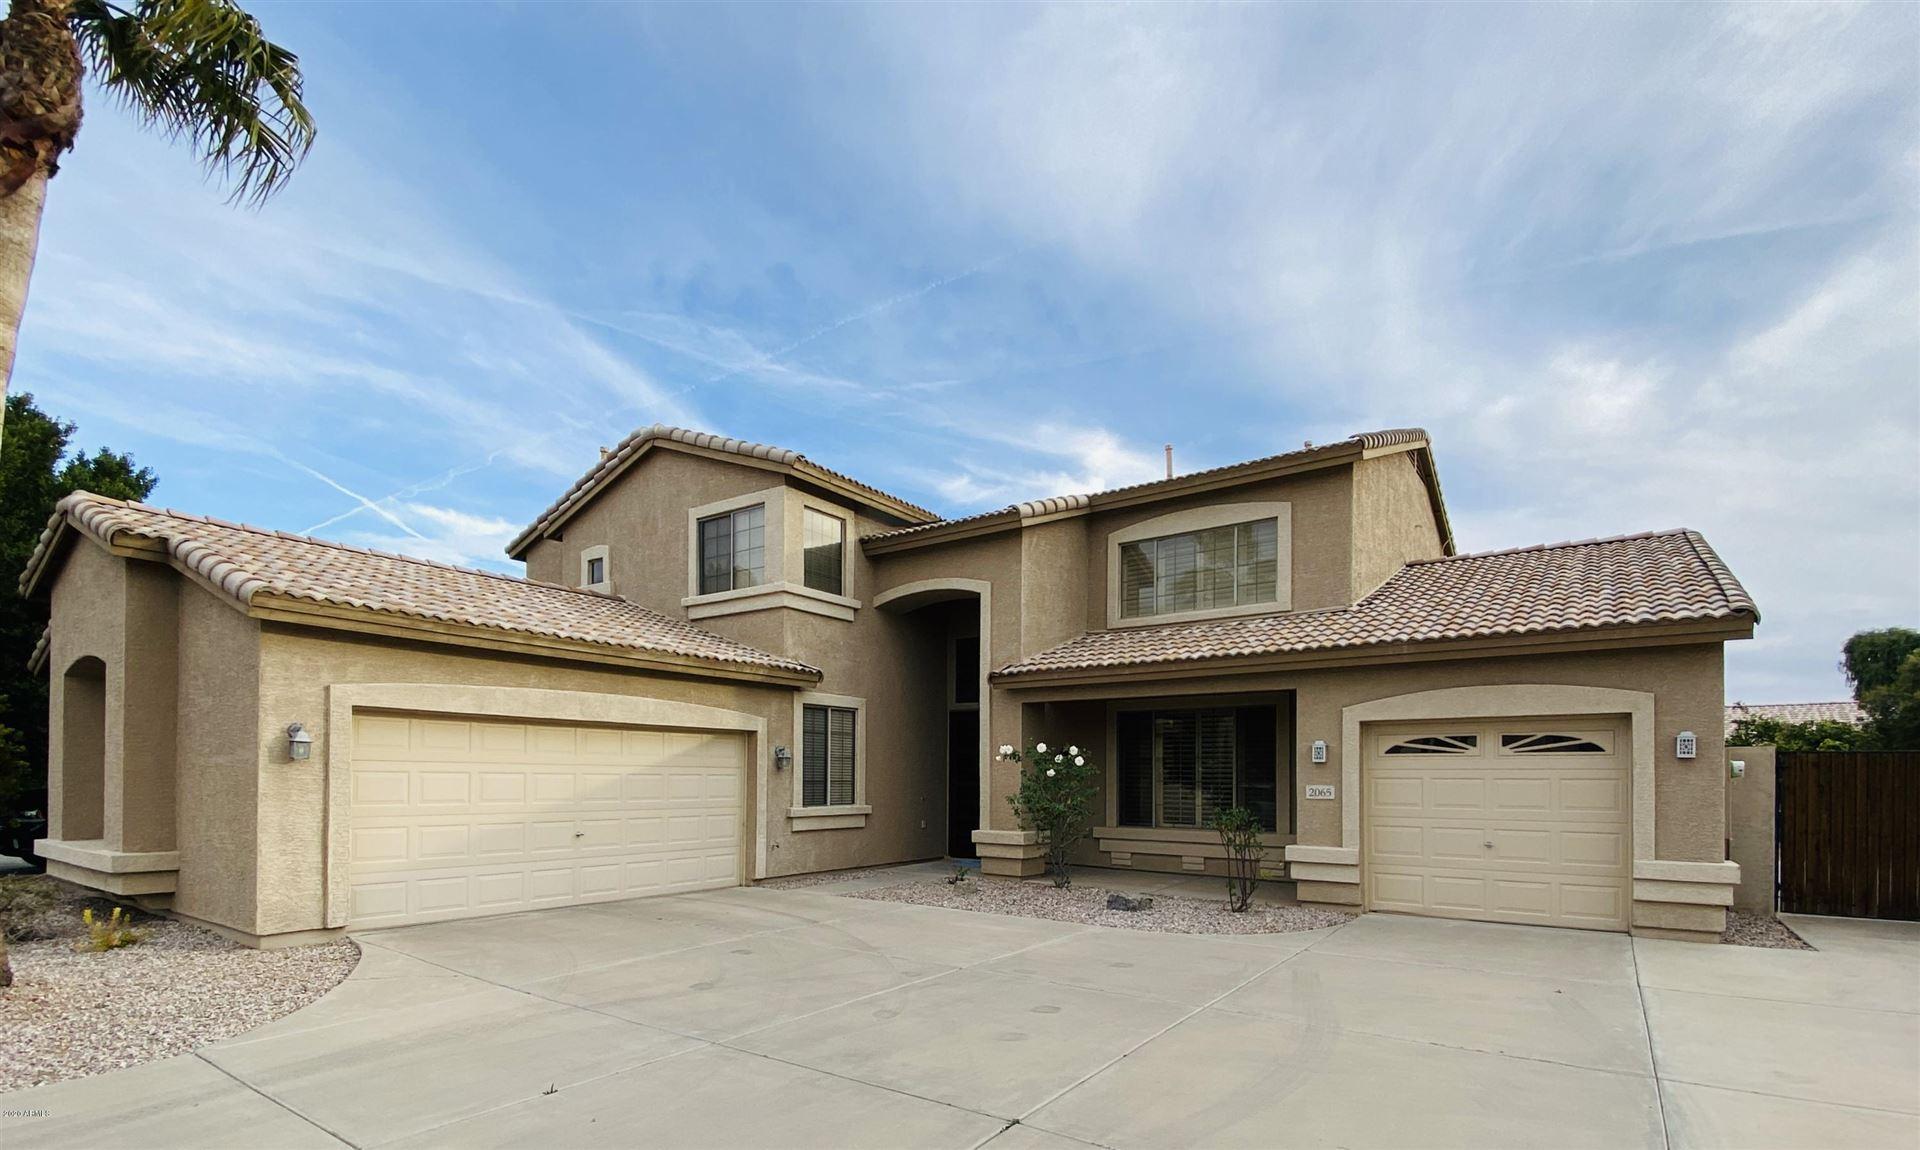 2065 W LONGHORN Drive, Chandler, AZ 85286 - #: 6087014